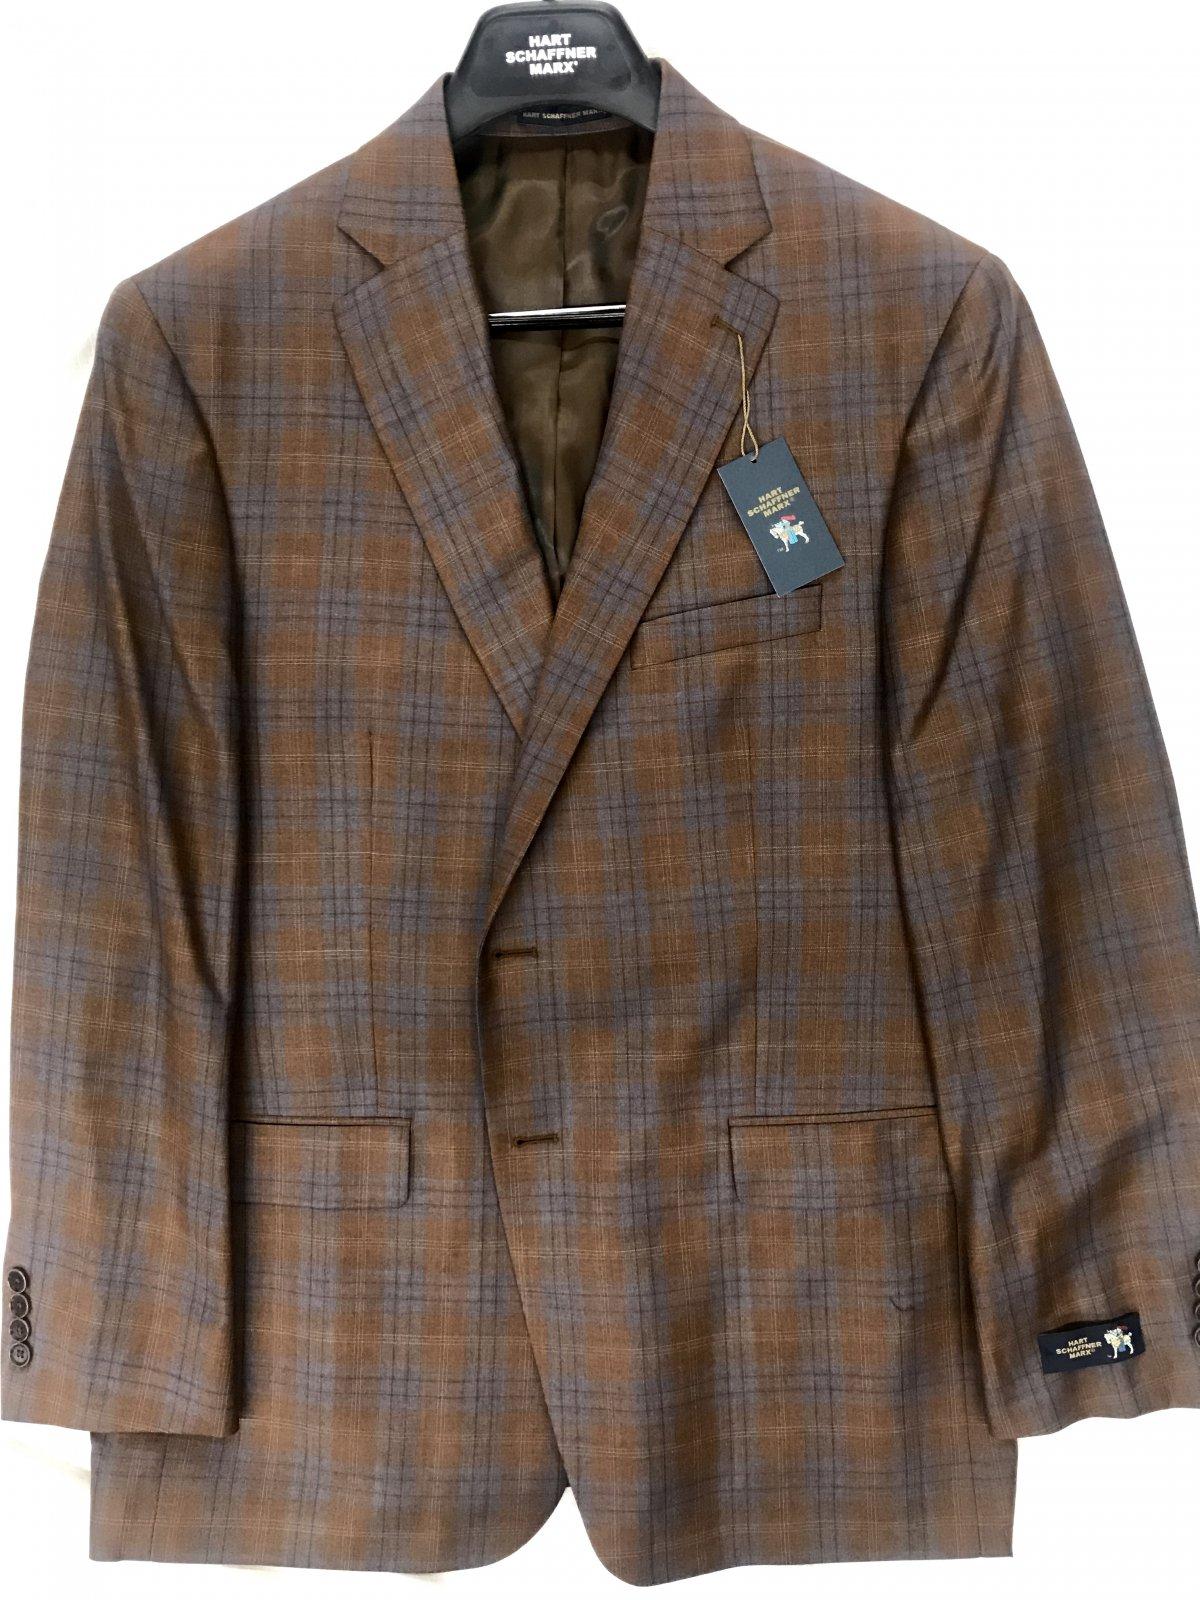 Hart Schaffner Marx Rust/Blue Plaid Sportcoat